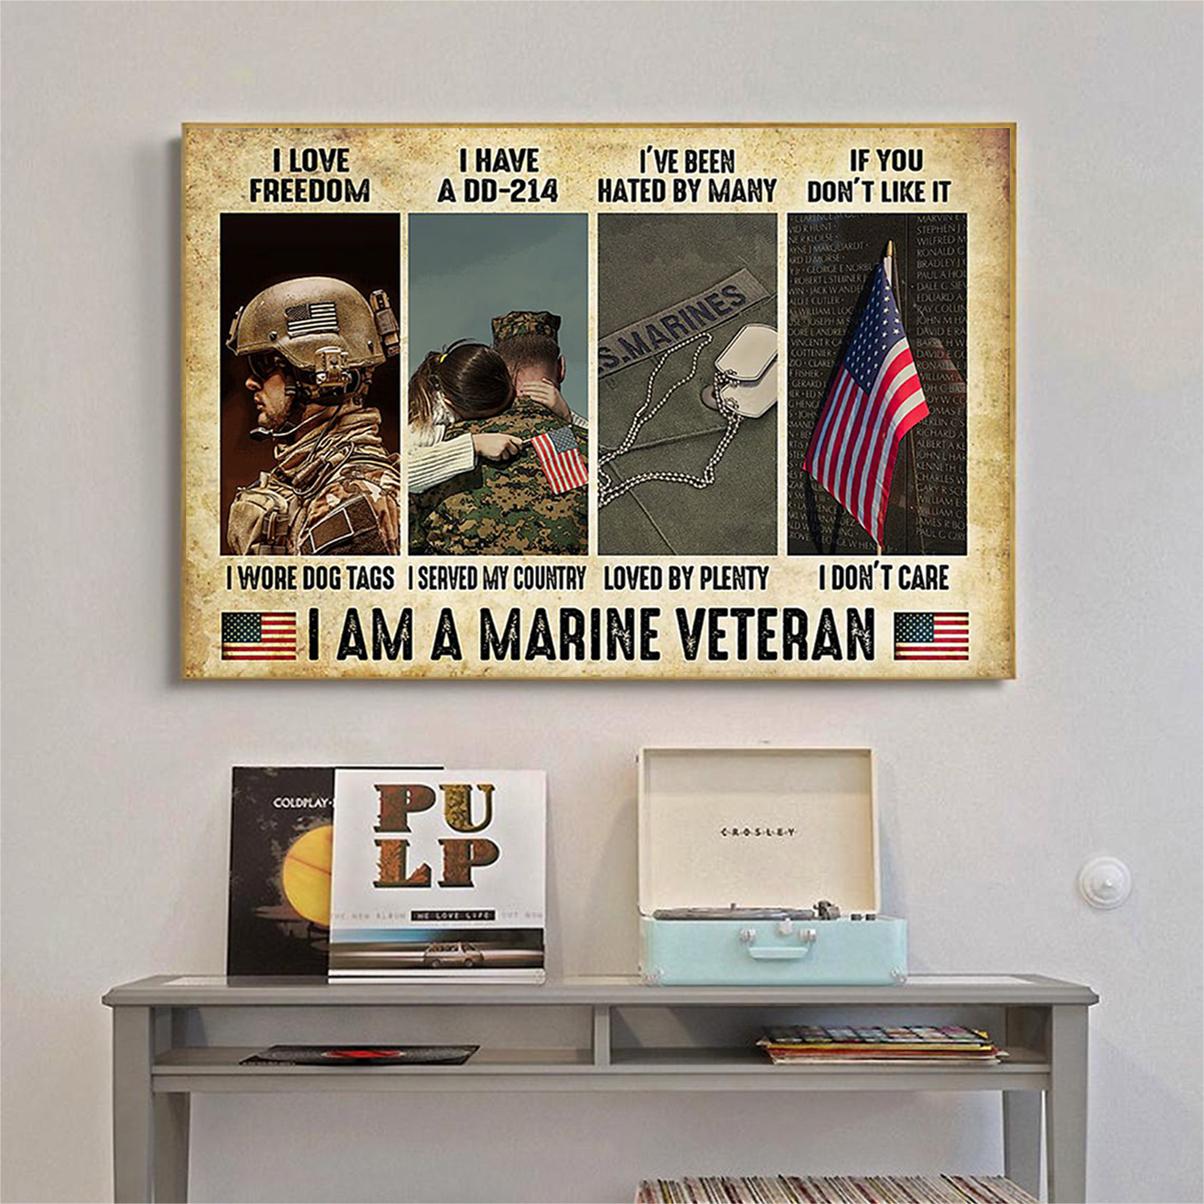 Marine Veteran i love freedom i have a dd-214 poster A1